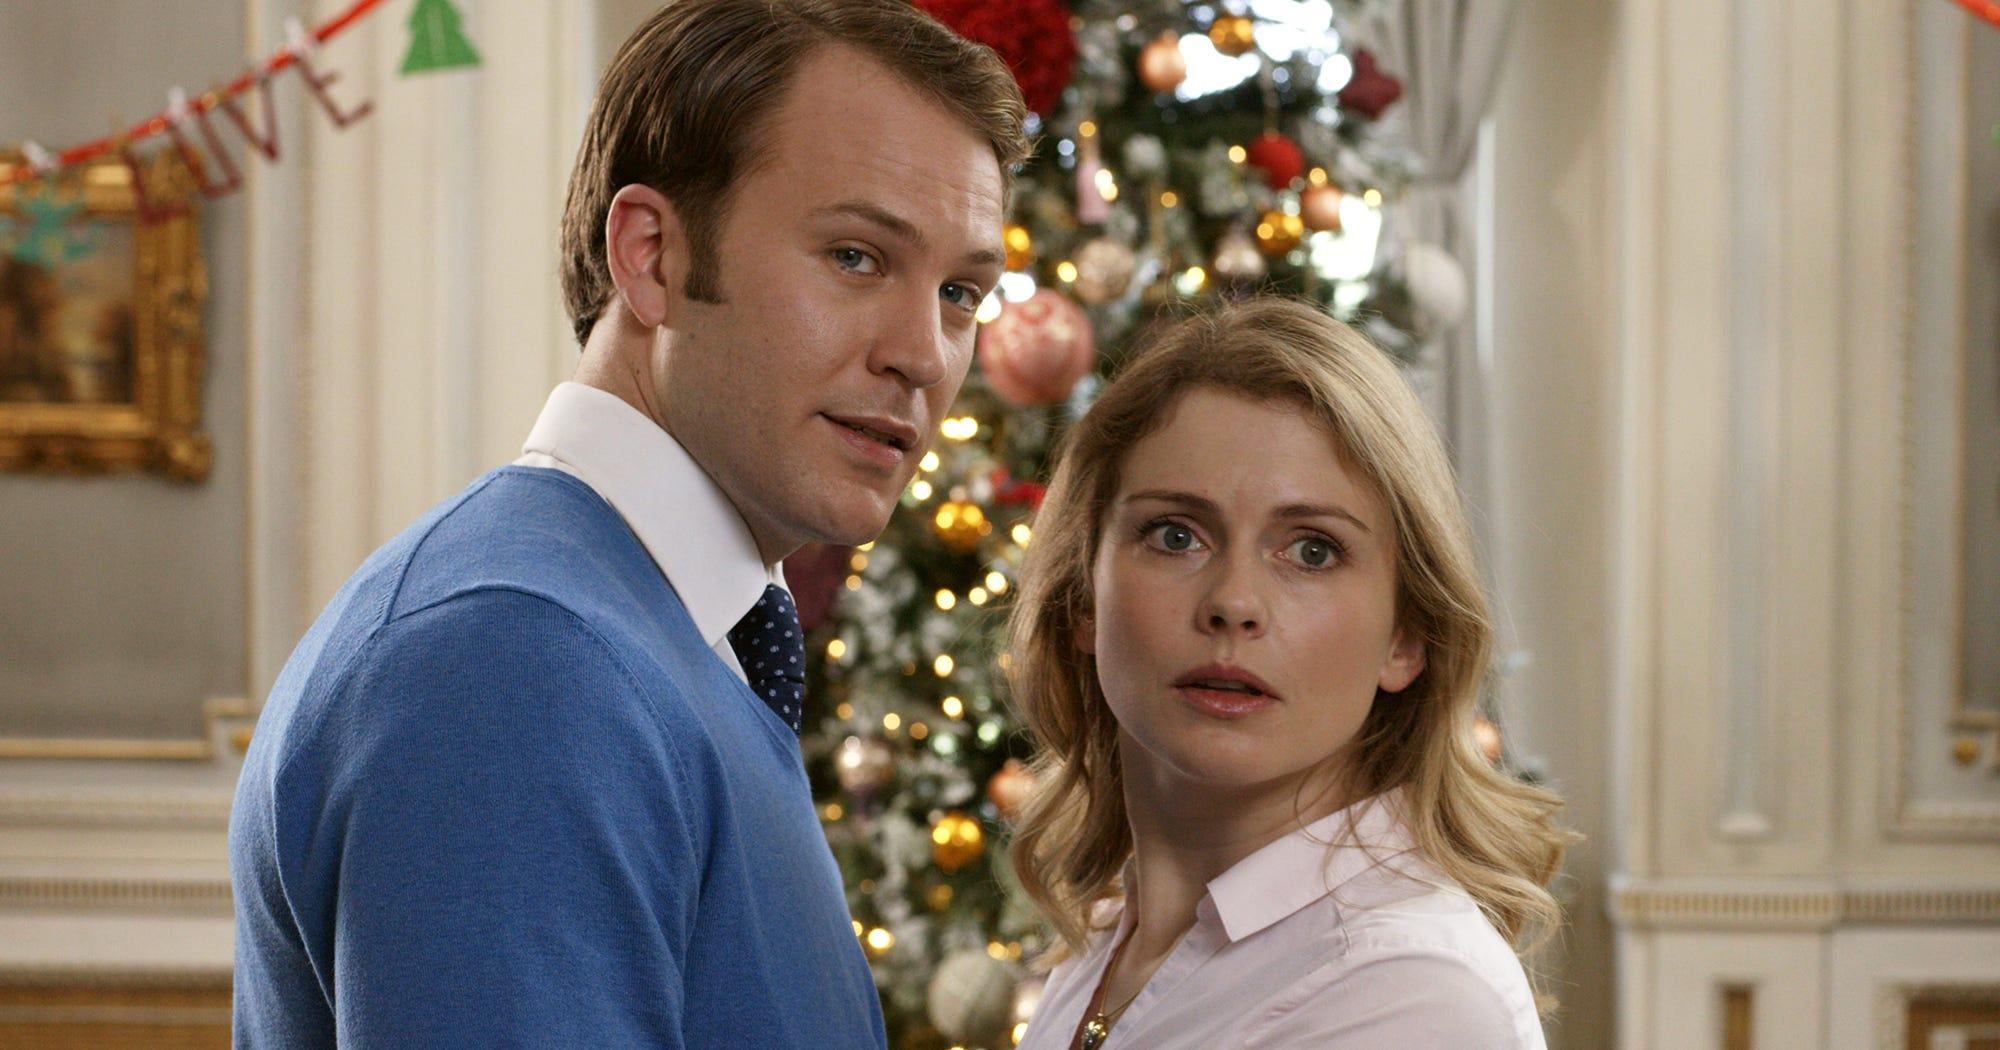 A Christmas Prince: Royal Wedding Cast Guide To Sequel